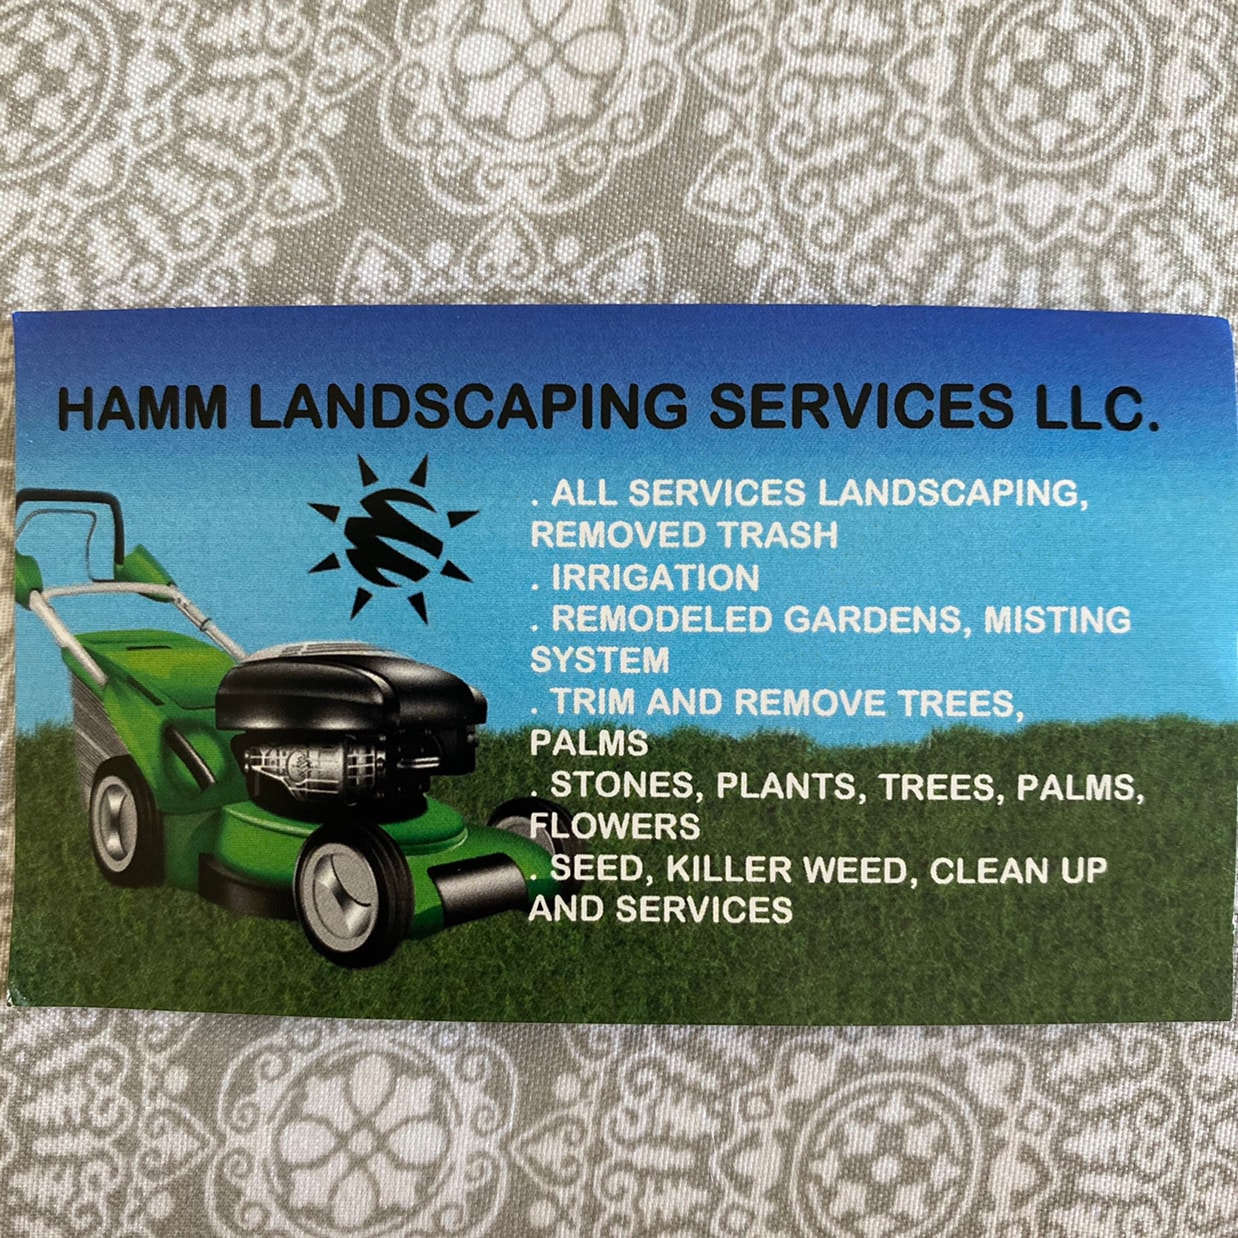 HAMM LANDSCAPING SERVICES LLC